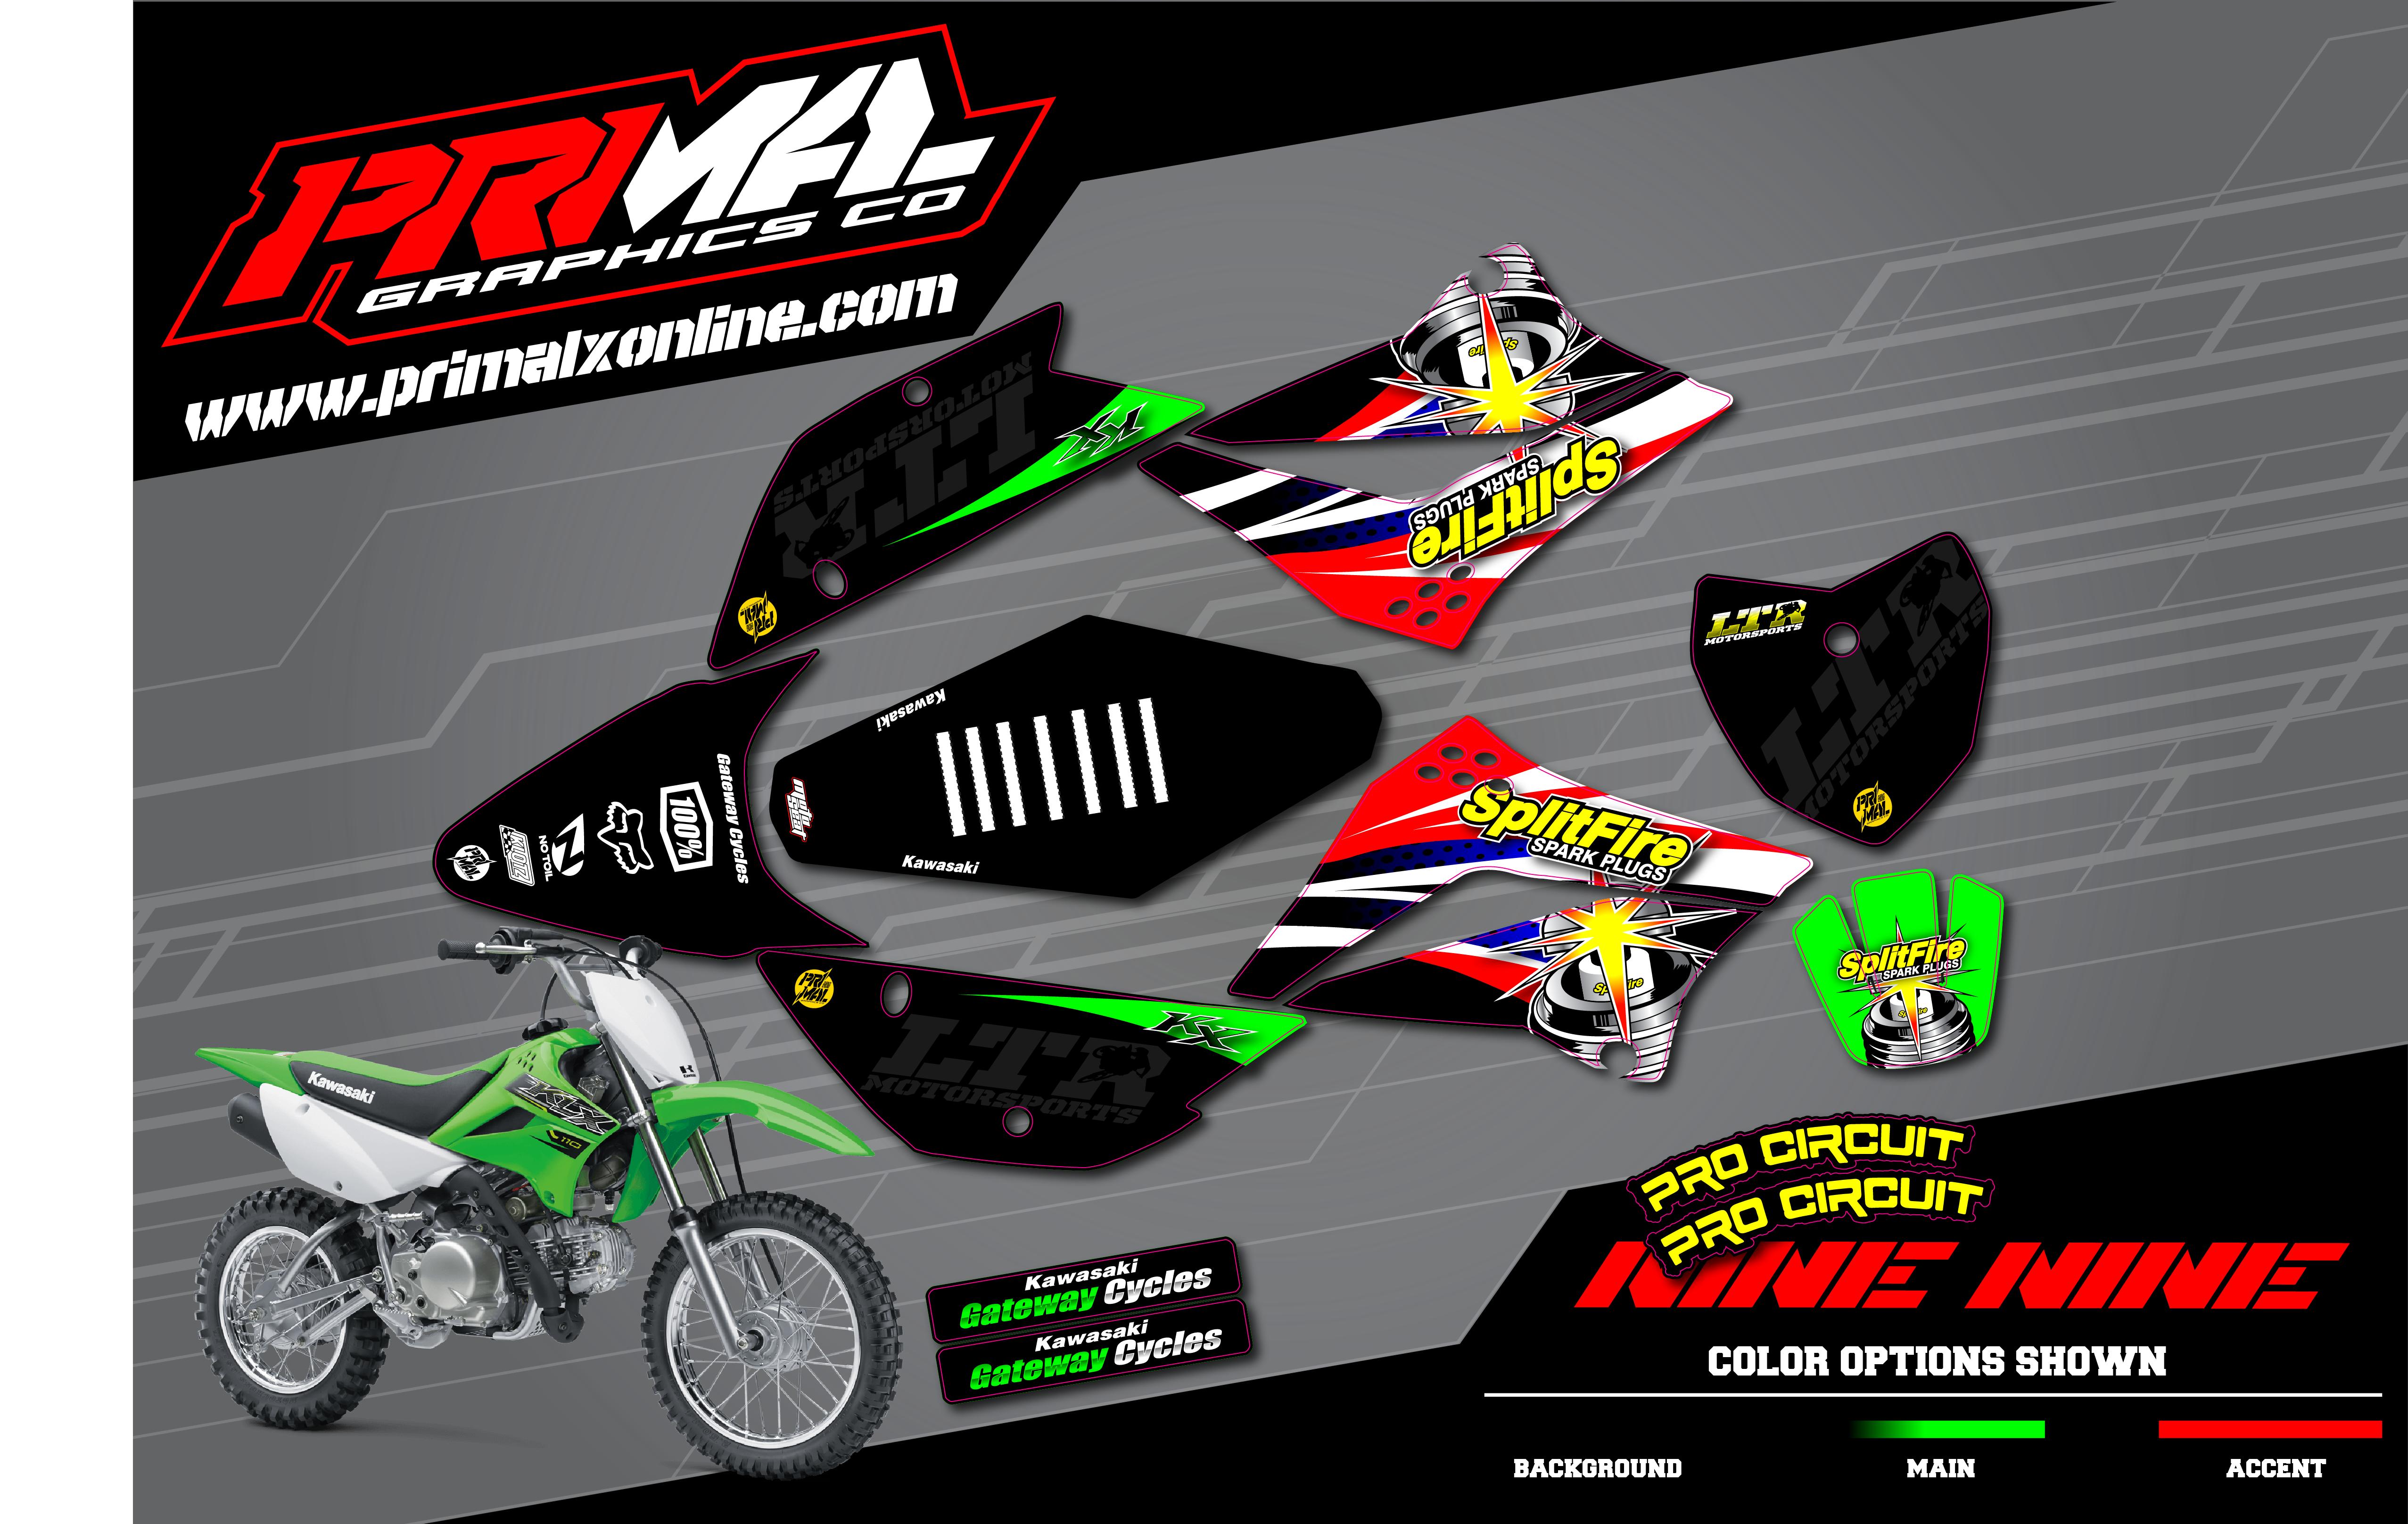 PRIMAL-X-MOTORSPORTS-PRIMAL-GRAPHICS-CO-KAWASAKI-KLX110SPLITFIRE-GRAPHICS-MX-GRAPHICS-MX-DECALS-QUAD-GRAPHICS